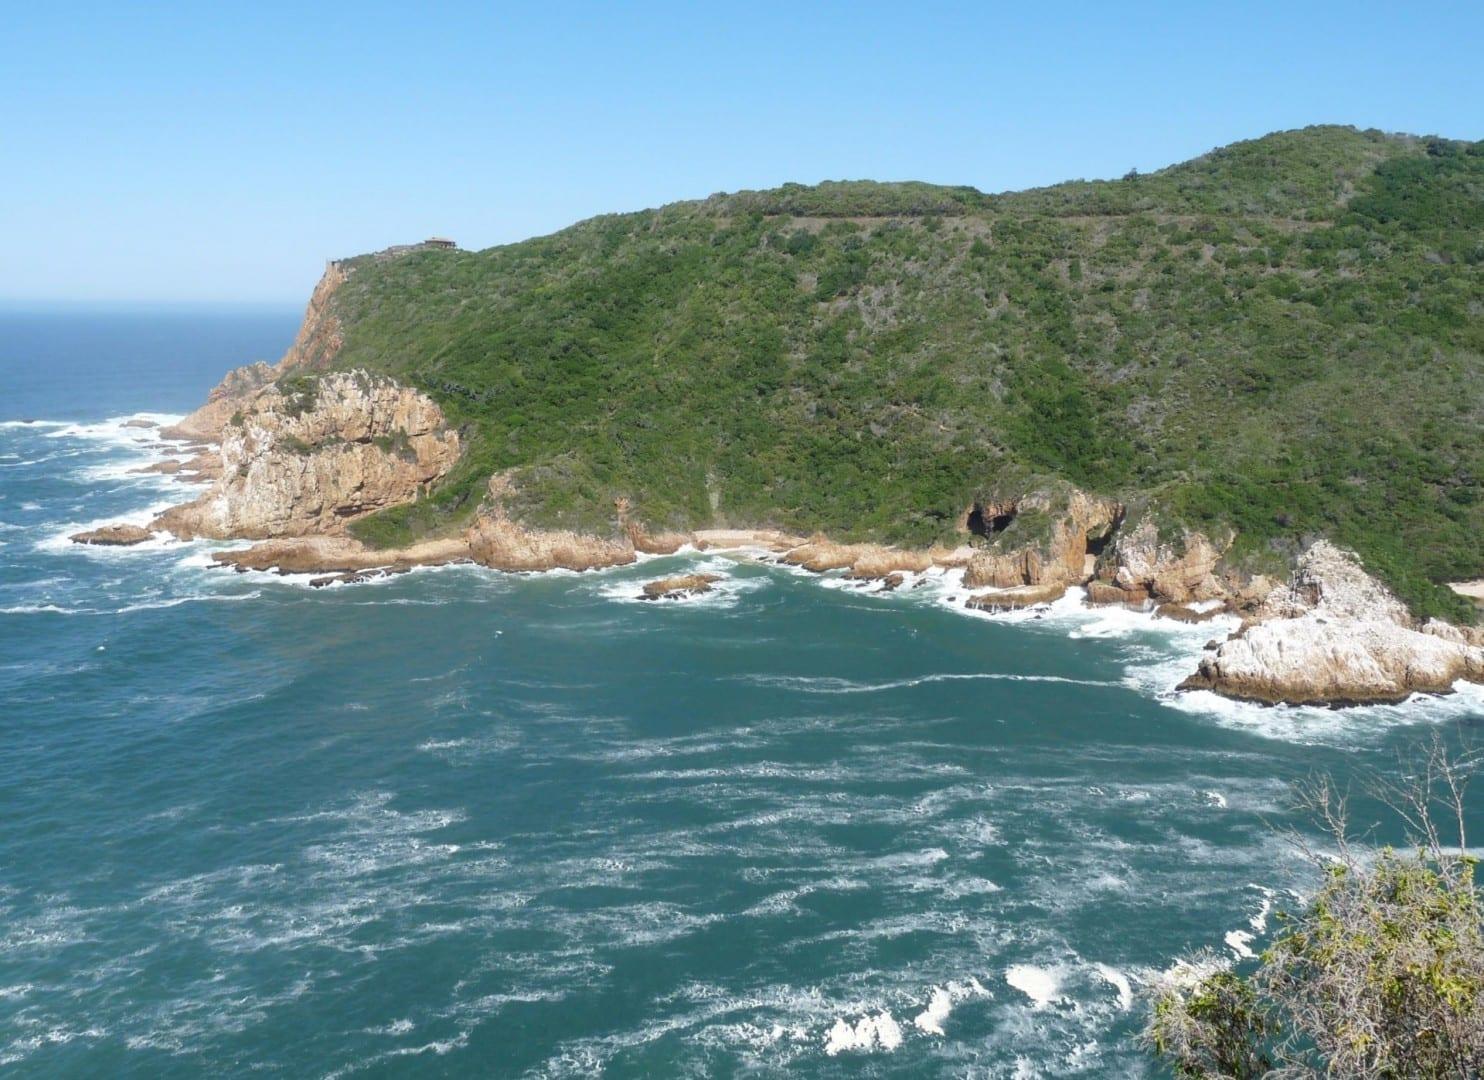 La Cabeza Occidental Knysna República de Sudáfrica